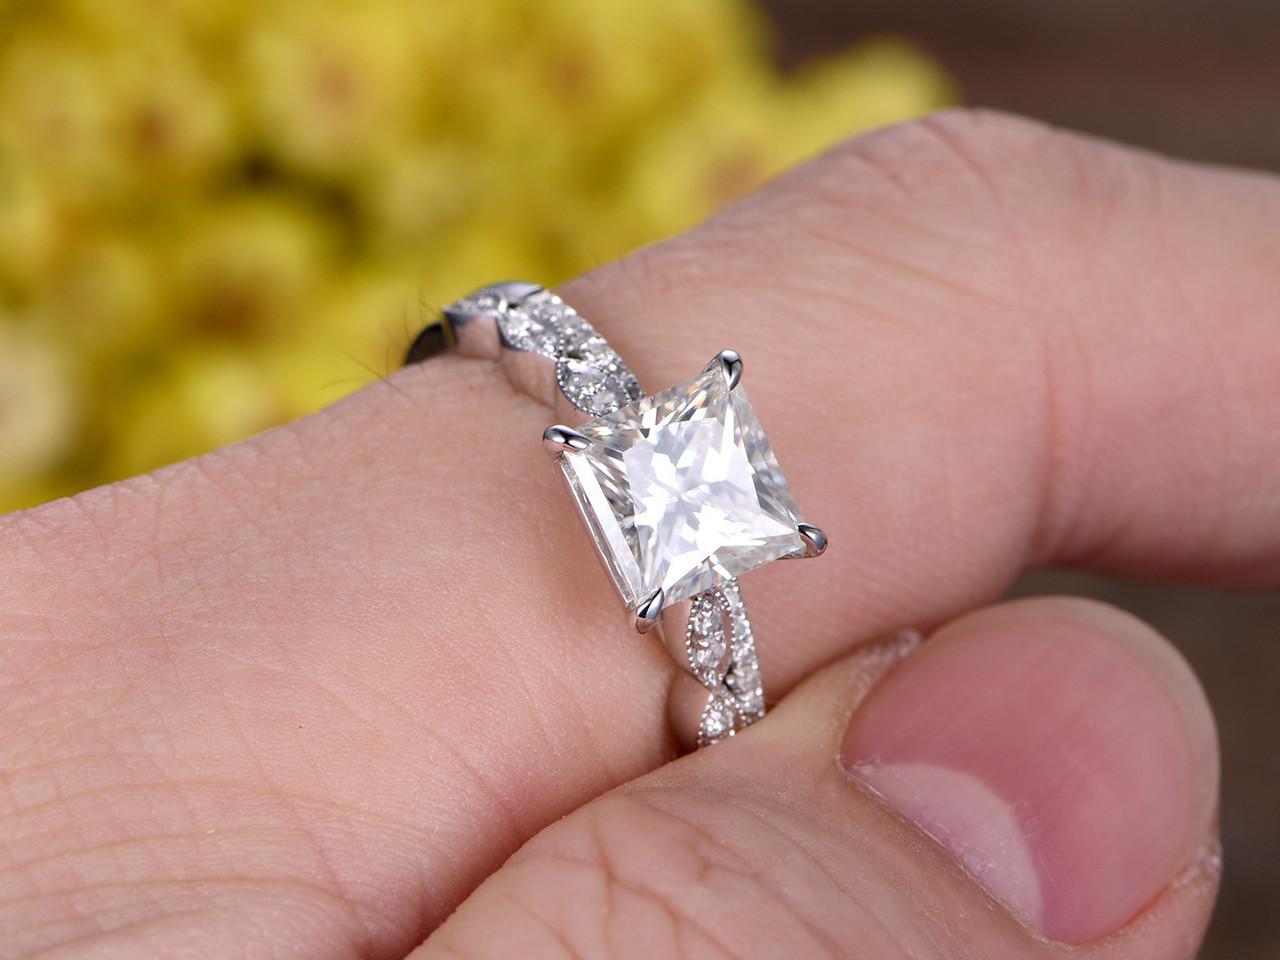 2 Carat Princess Cut Moissanite Engagement Ring Set Diamond Wedding Band 14k White Gold Art Deco Half Eternity Bbbgem